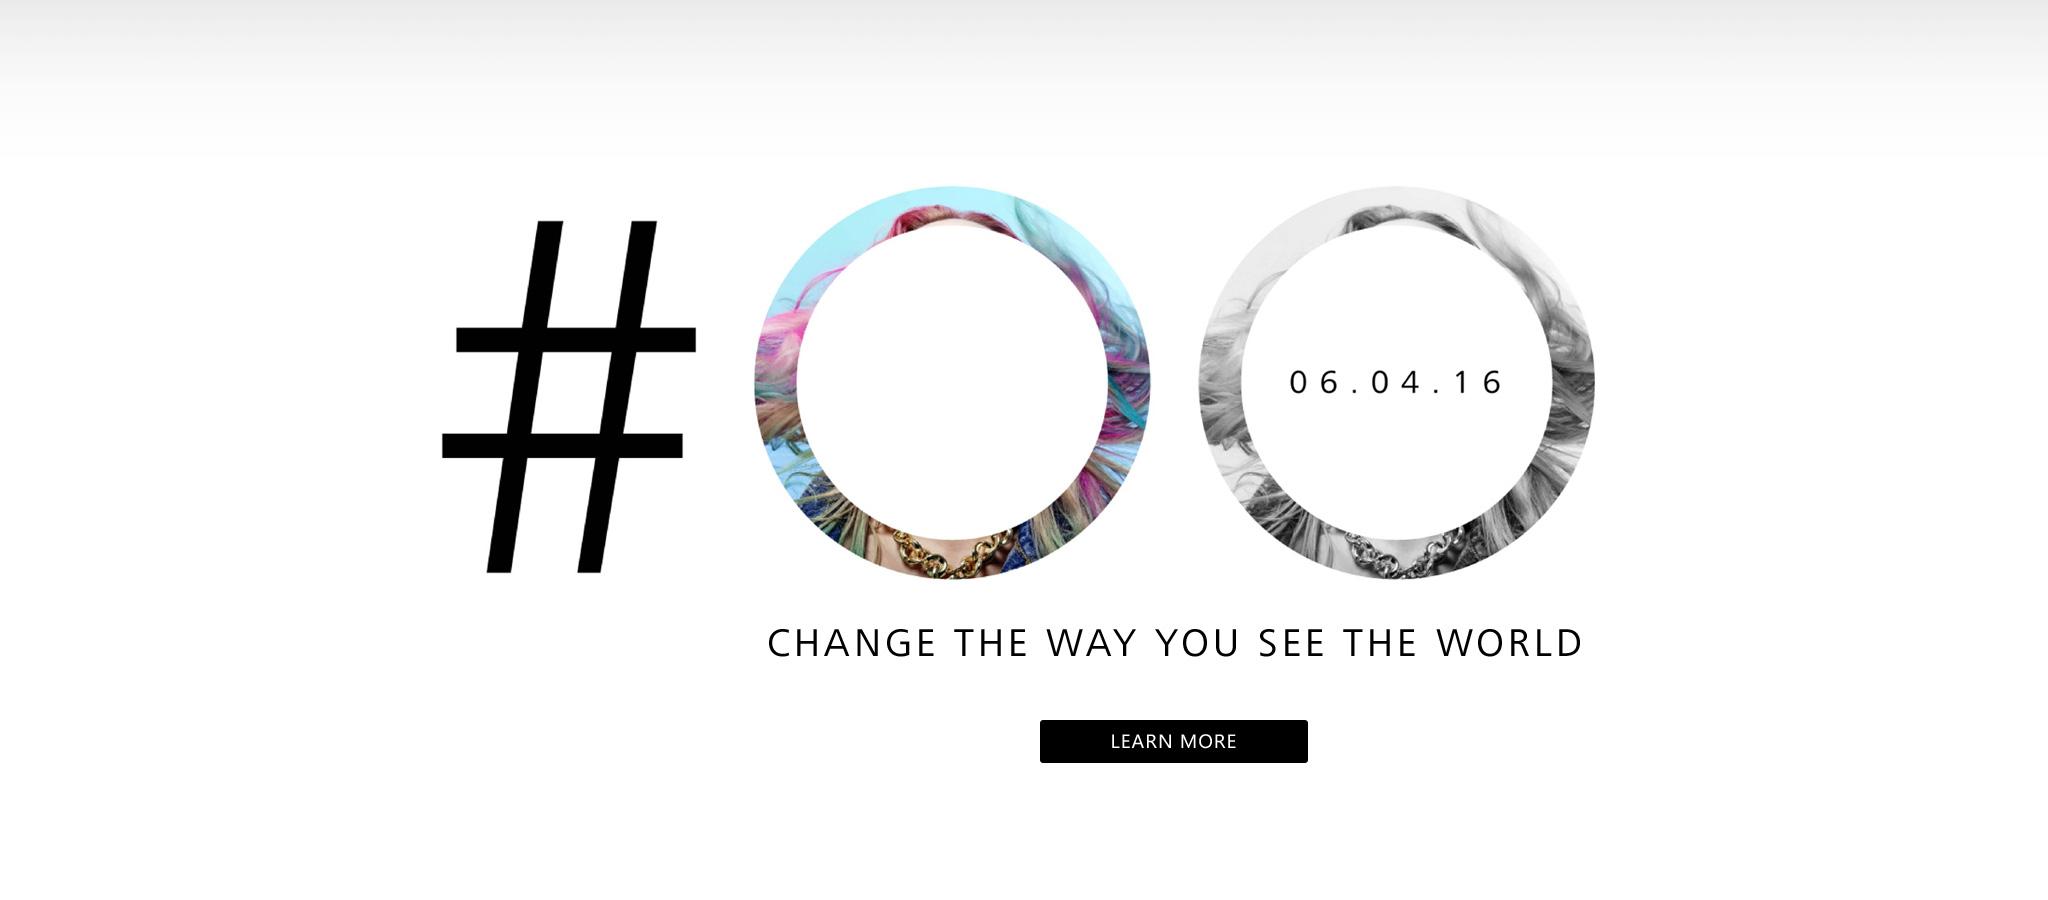 Huawei ปล่อยภาพโปรโมต Huawei P9 โดยมีการใช้ Hashtag #OO